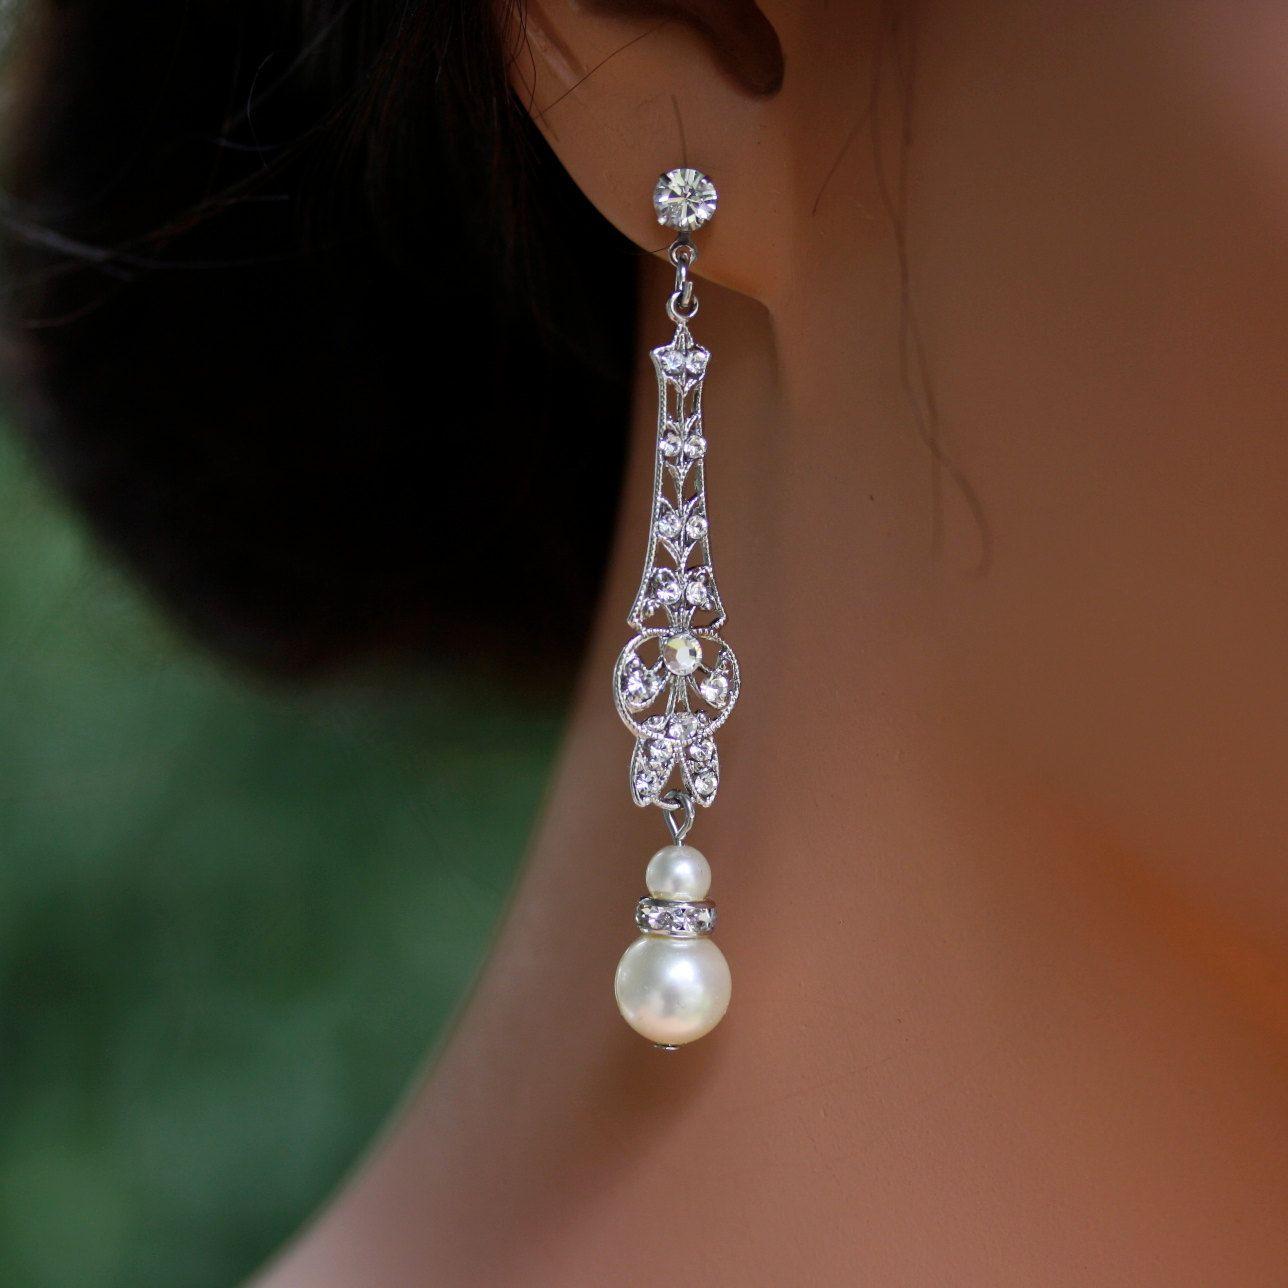 wedding earrings Wedding Jewelry Bridal Earrings Long Art Deco Dangle Earrings with Pearl and Rhinestone